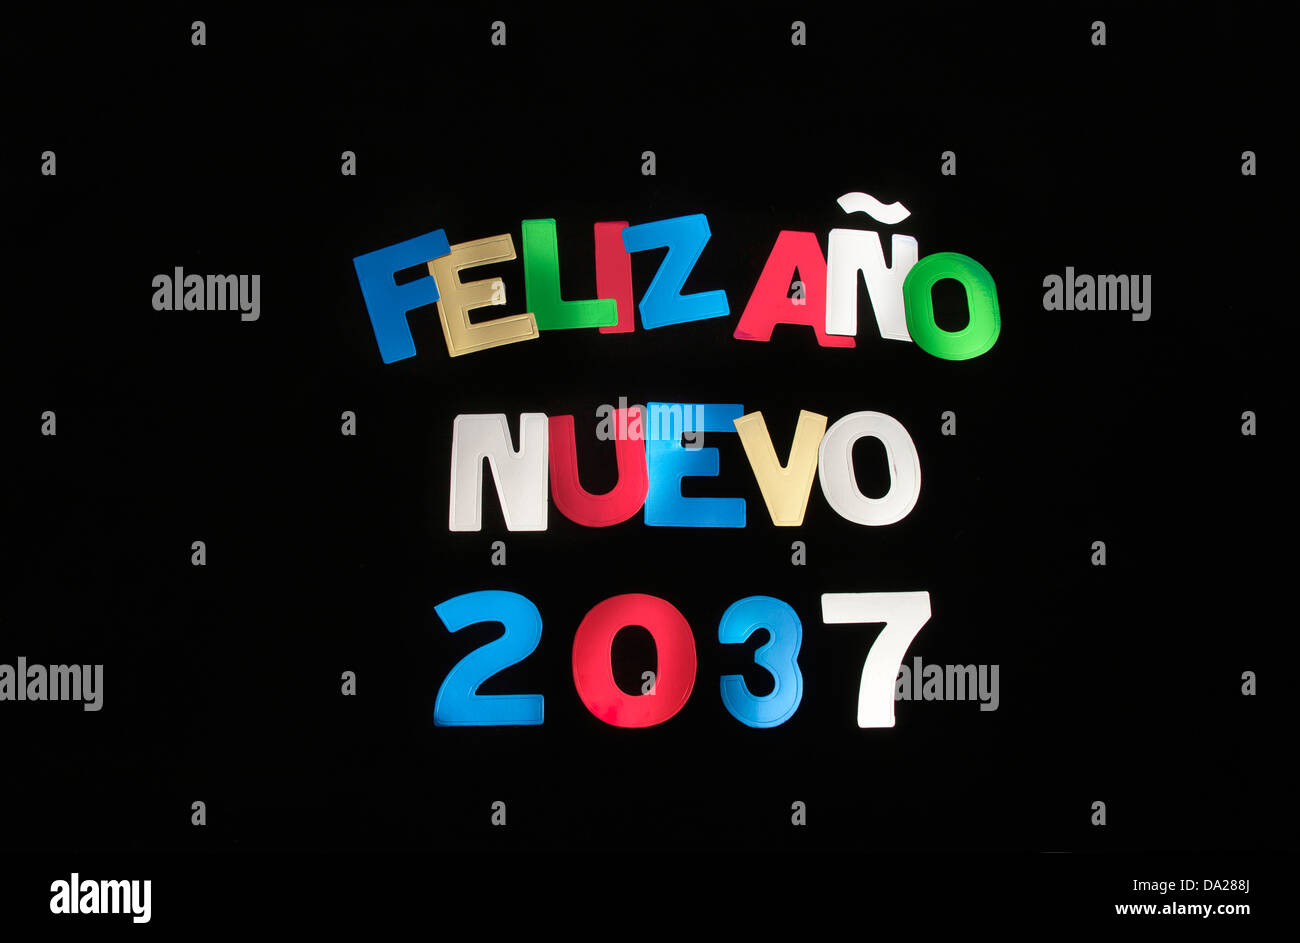 FELIZ ANO NUEVO 2037 - Stock Image